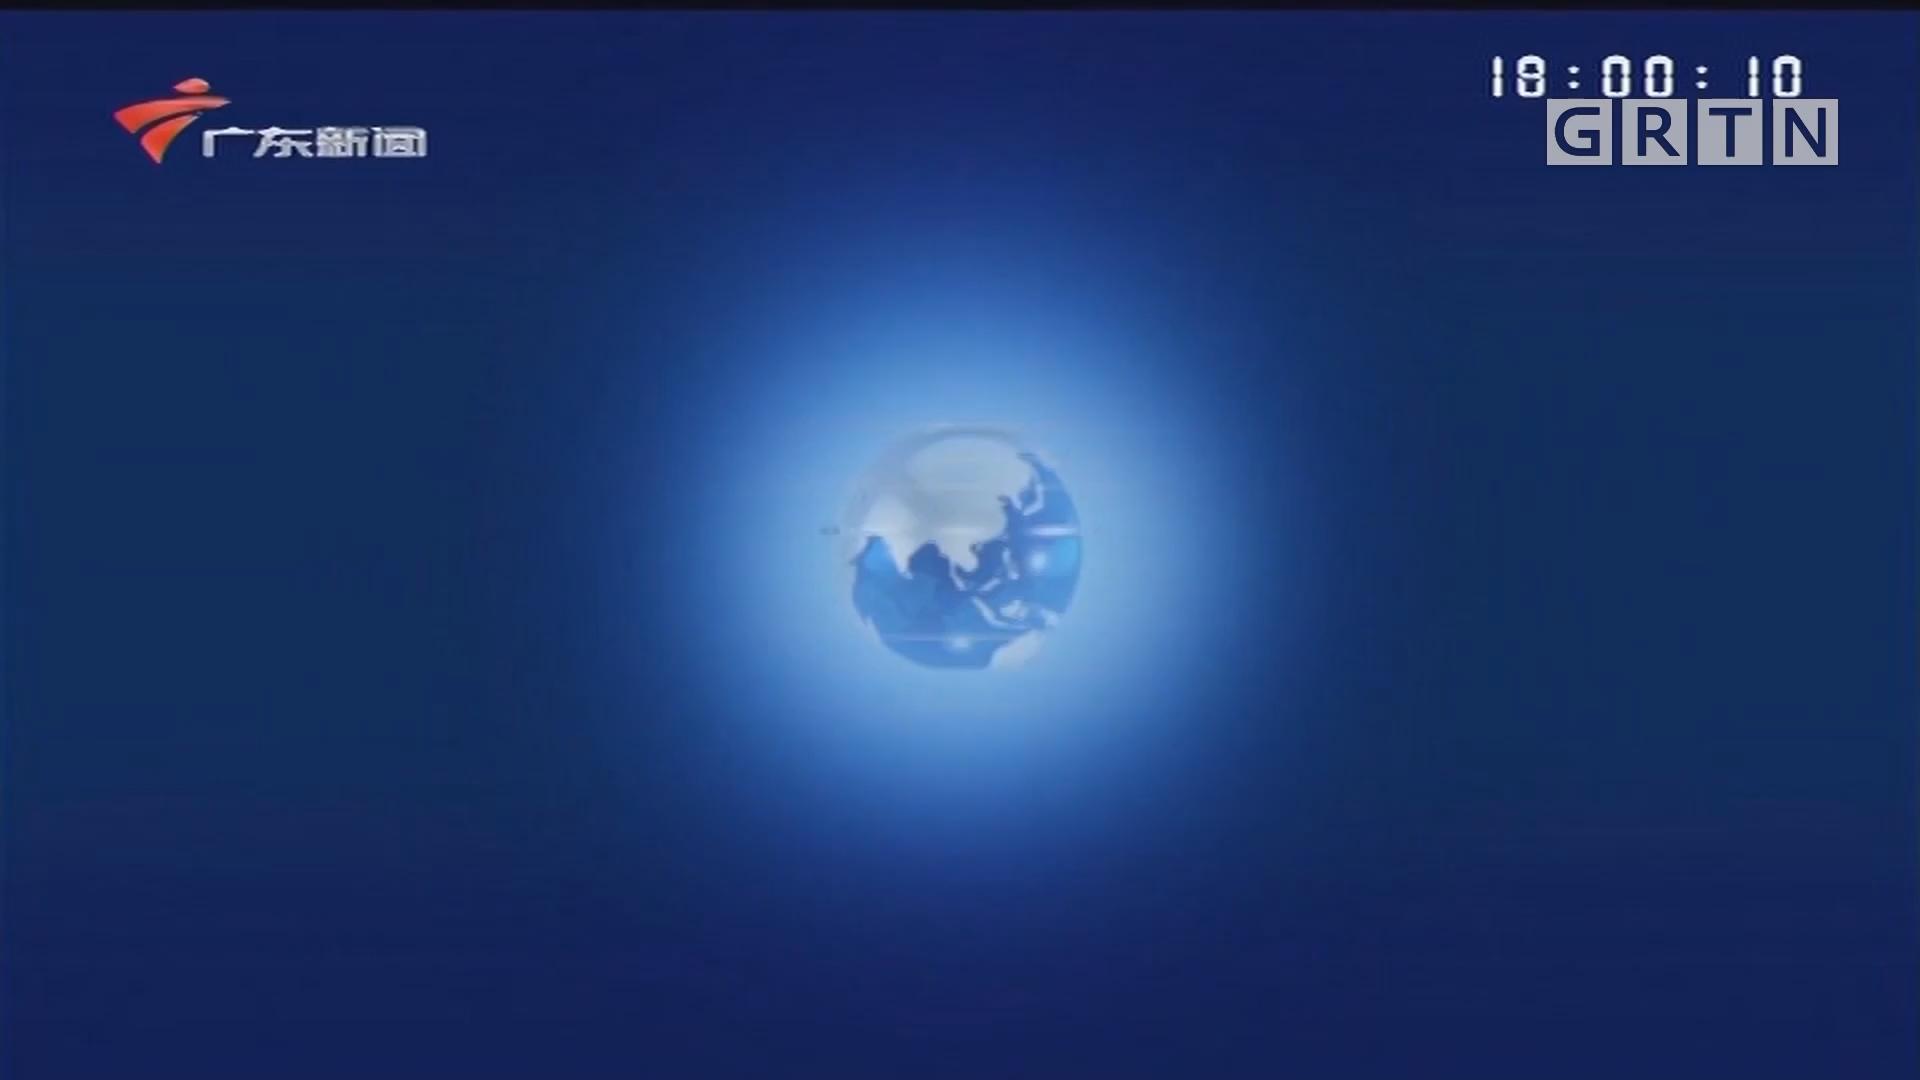 [HD][2020-01-17-18:00]正点播报:冻结涉赌资金180亿! 公安部重拳打击跨境网络赌博犯罪